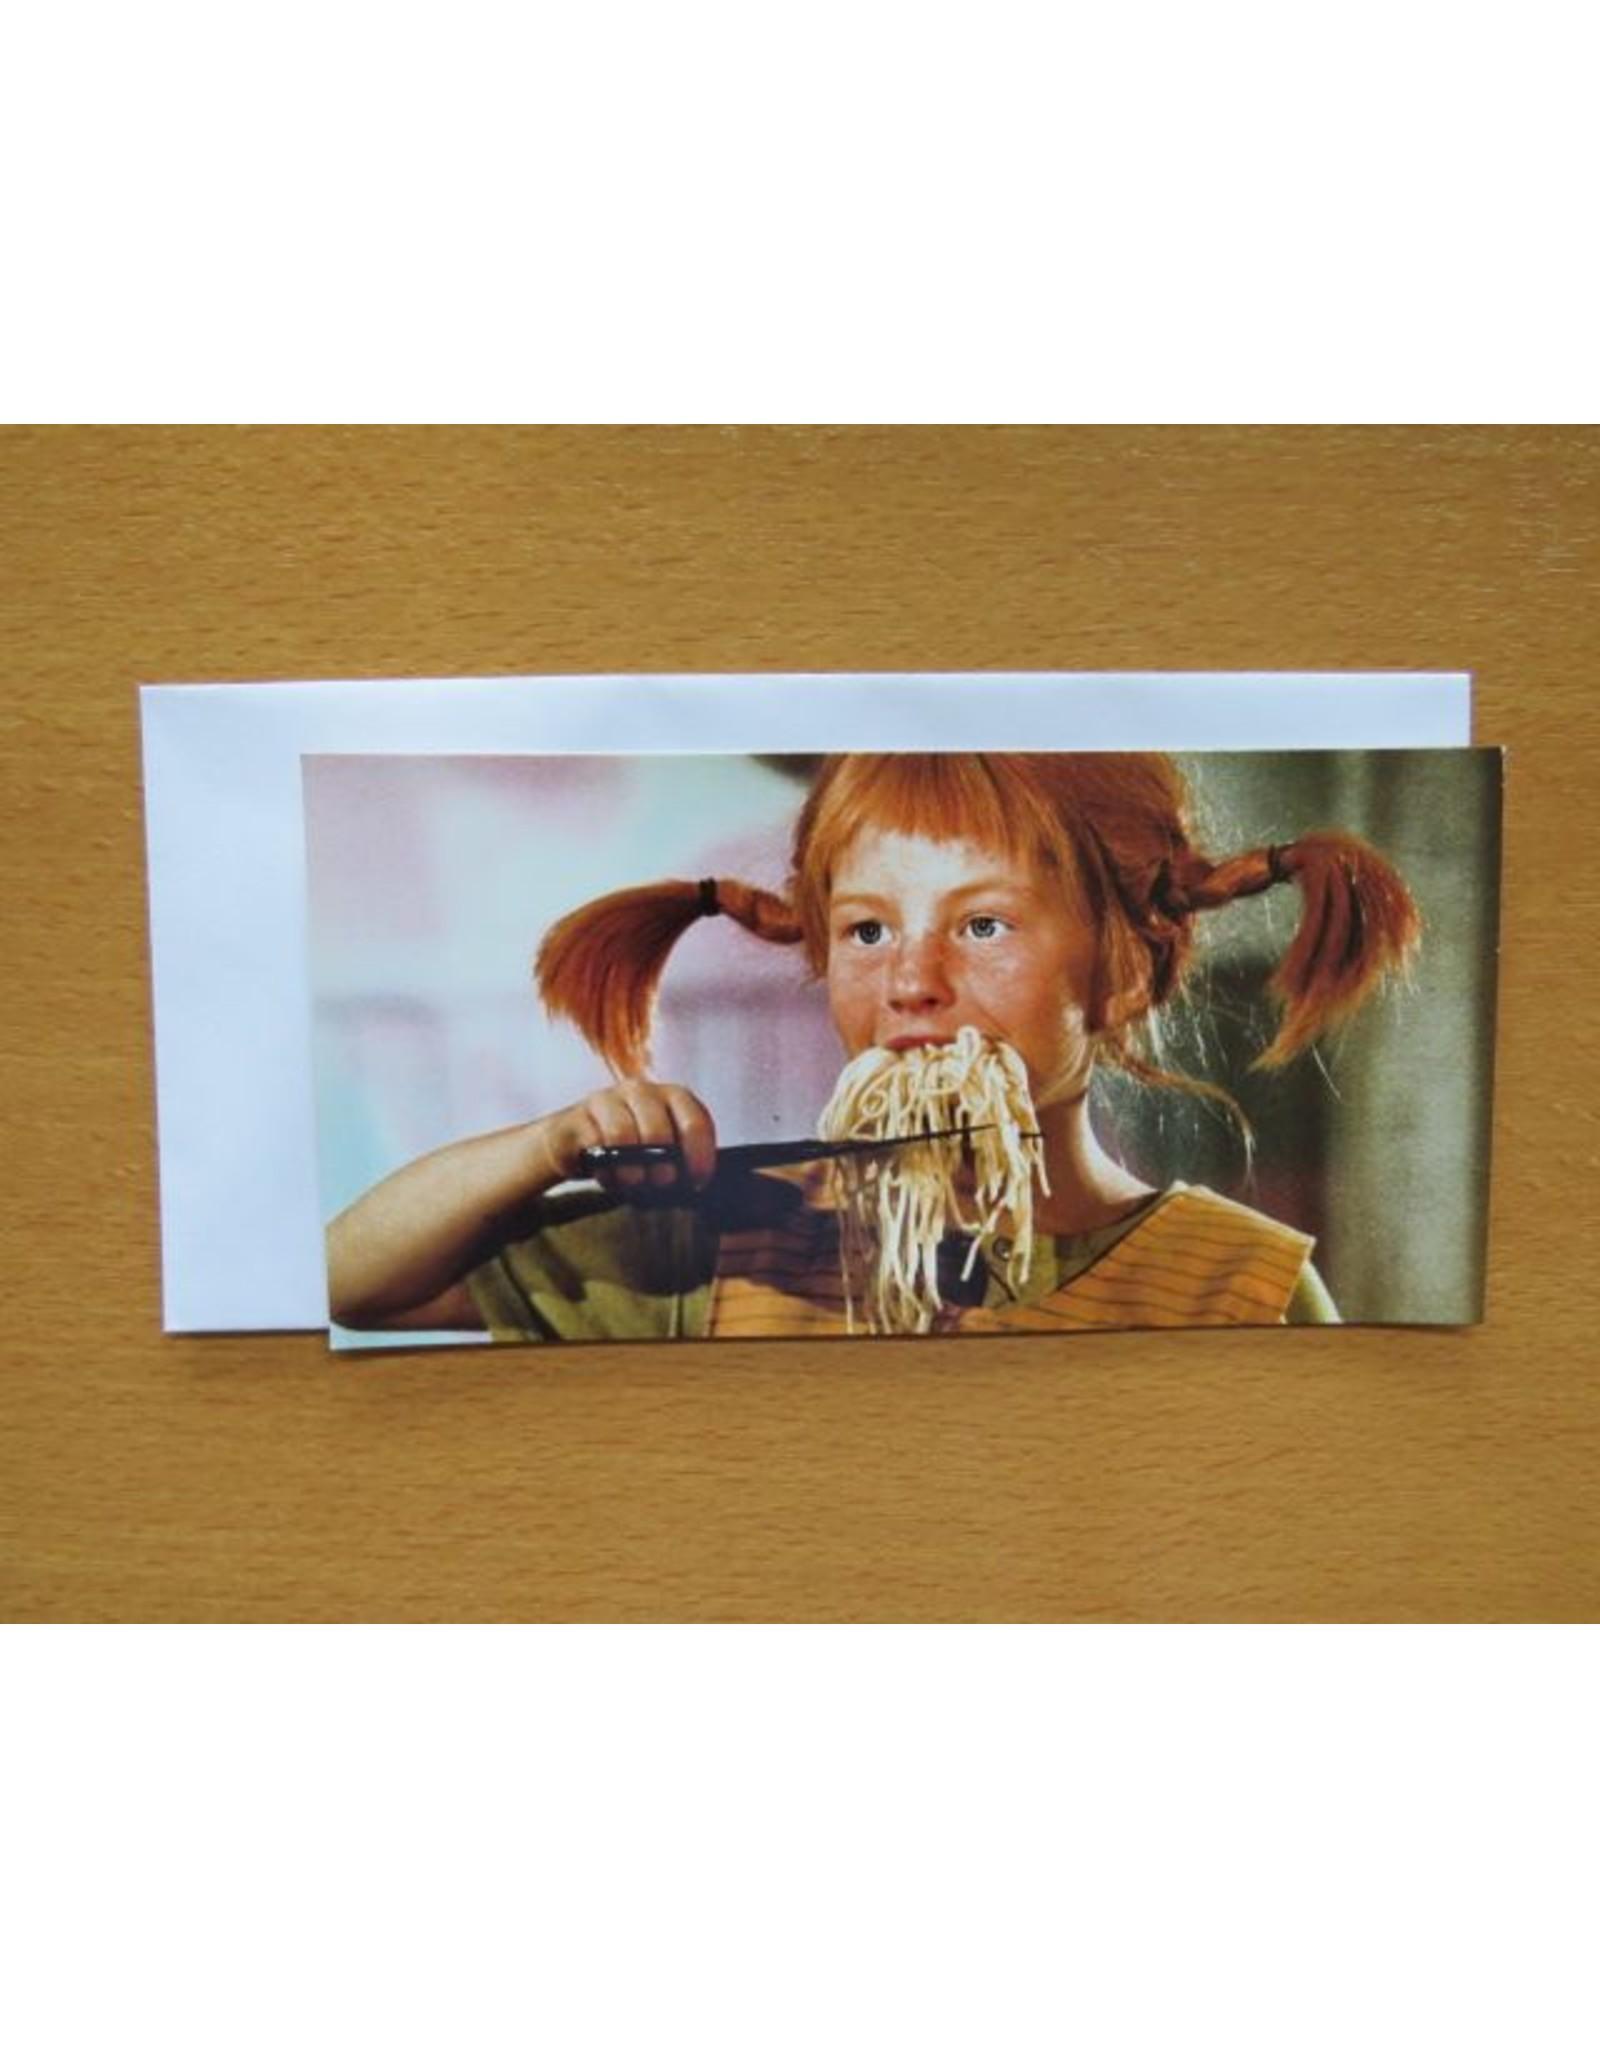 Pippi Langkous Pippi Longstocking card - Eating spaghetti